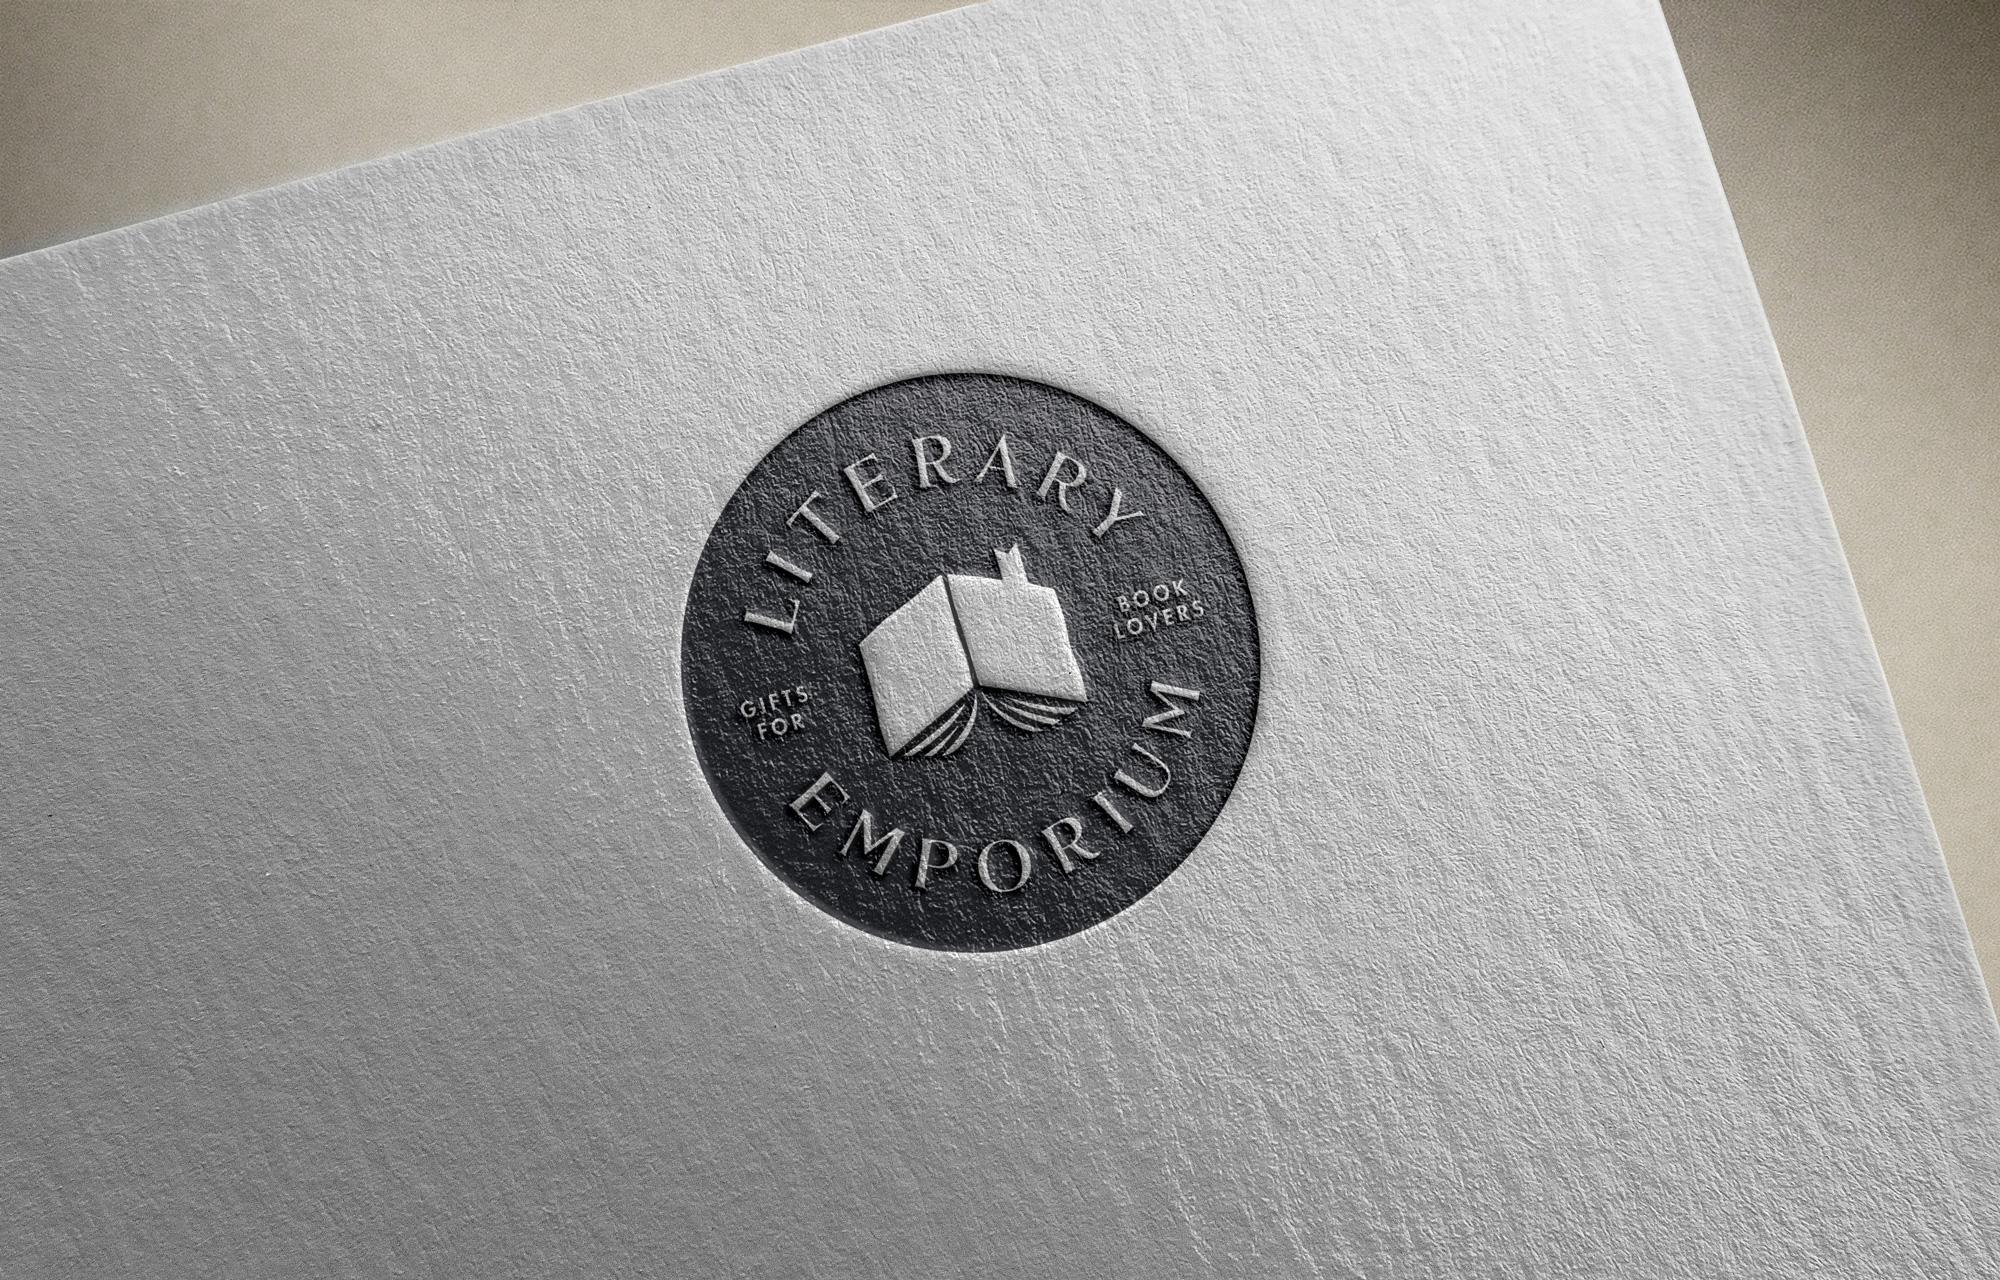 New Logo and Identity for Literary Emporium by Fiasco Design